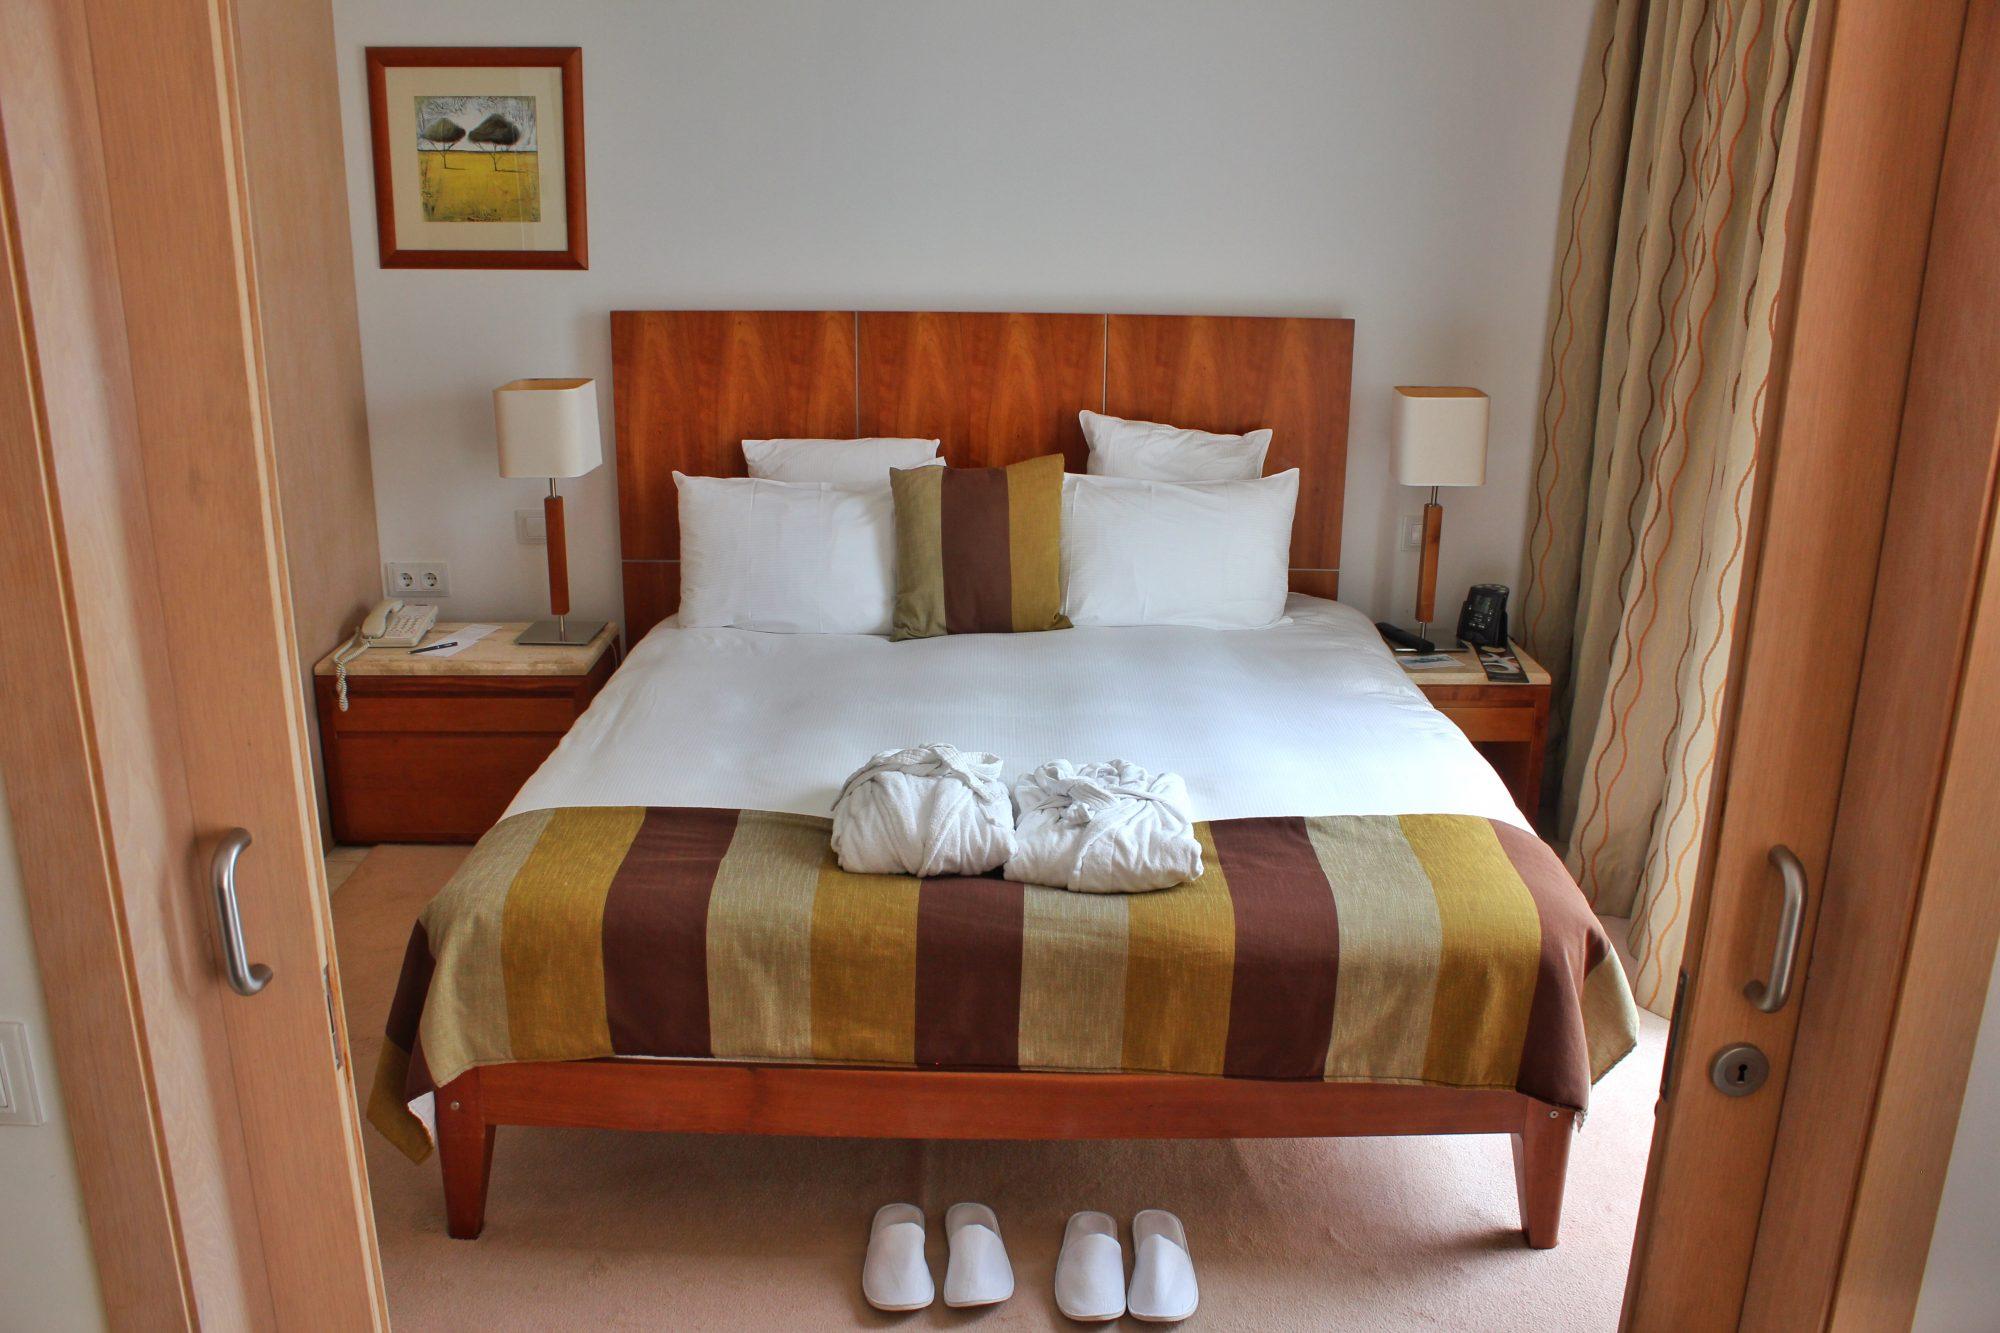 Apartment tour at Hilton Vilamoura As Cascatas Golf Resort & Spa, Portugal (Video)